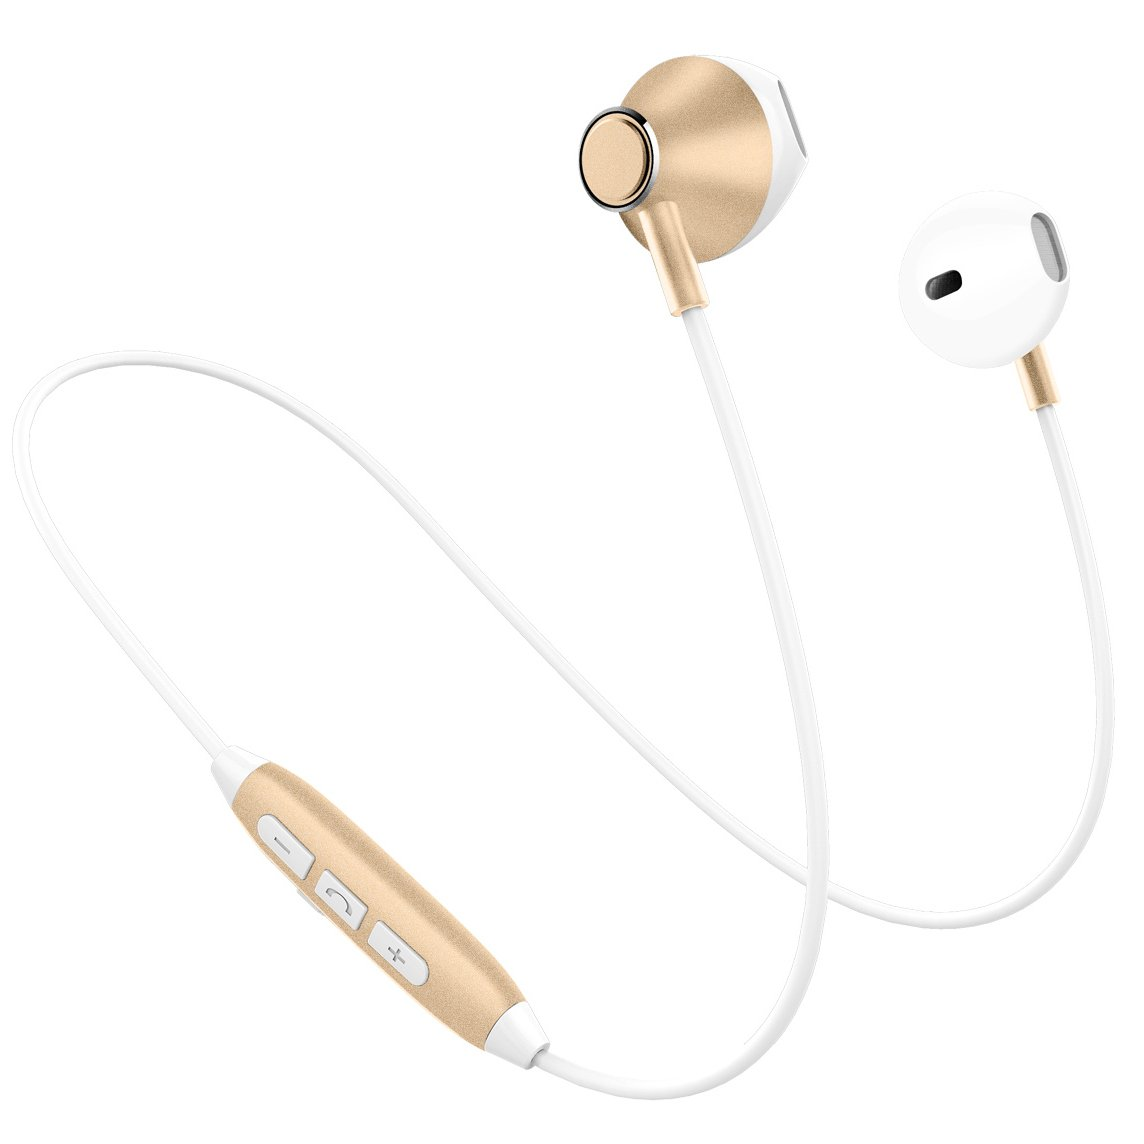 Wireless Headphones, Bluetooth Sport Headphones, in-Ear Earphones with Mic, HD Stereo Magnetic Earbud, Sweatproof, IPX4 Waterproof Lightweight Secure fit for Gym Running Jogging White Gold